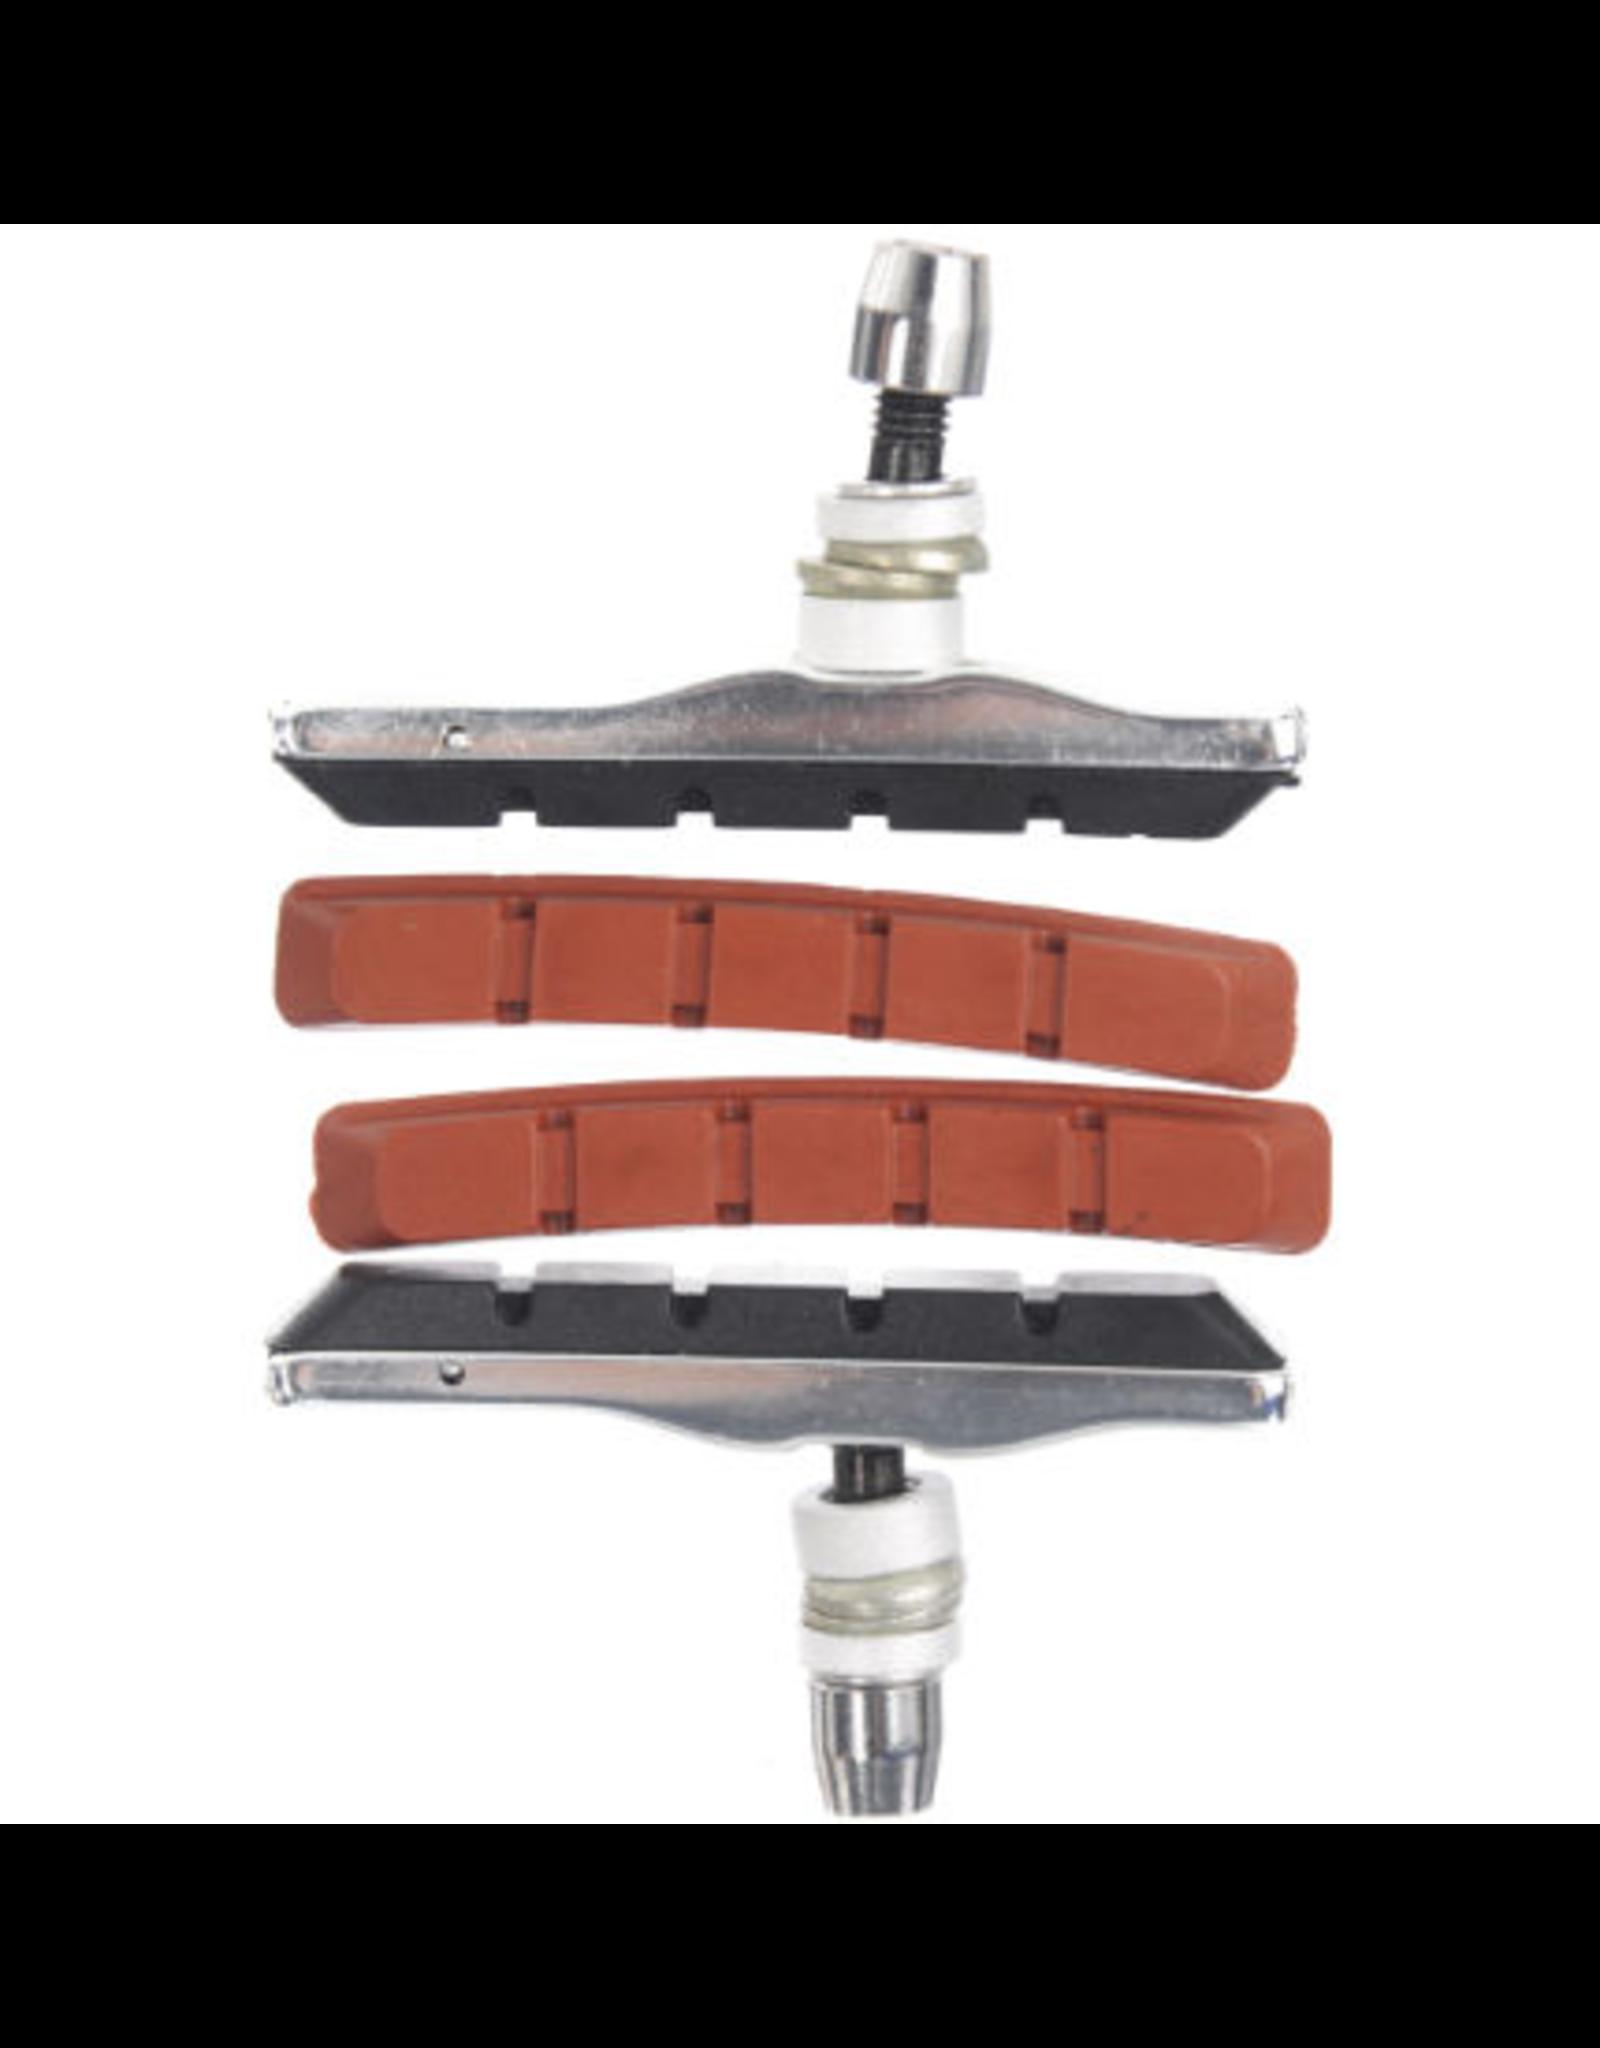 CLARK'S BRAKE PADS RIM CLARKS MTB/BMX CARTRIDGE INC. SPARE PADS